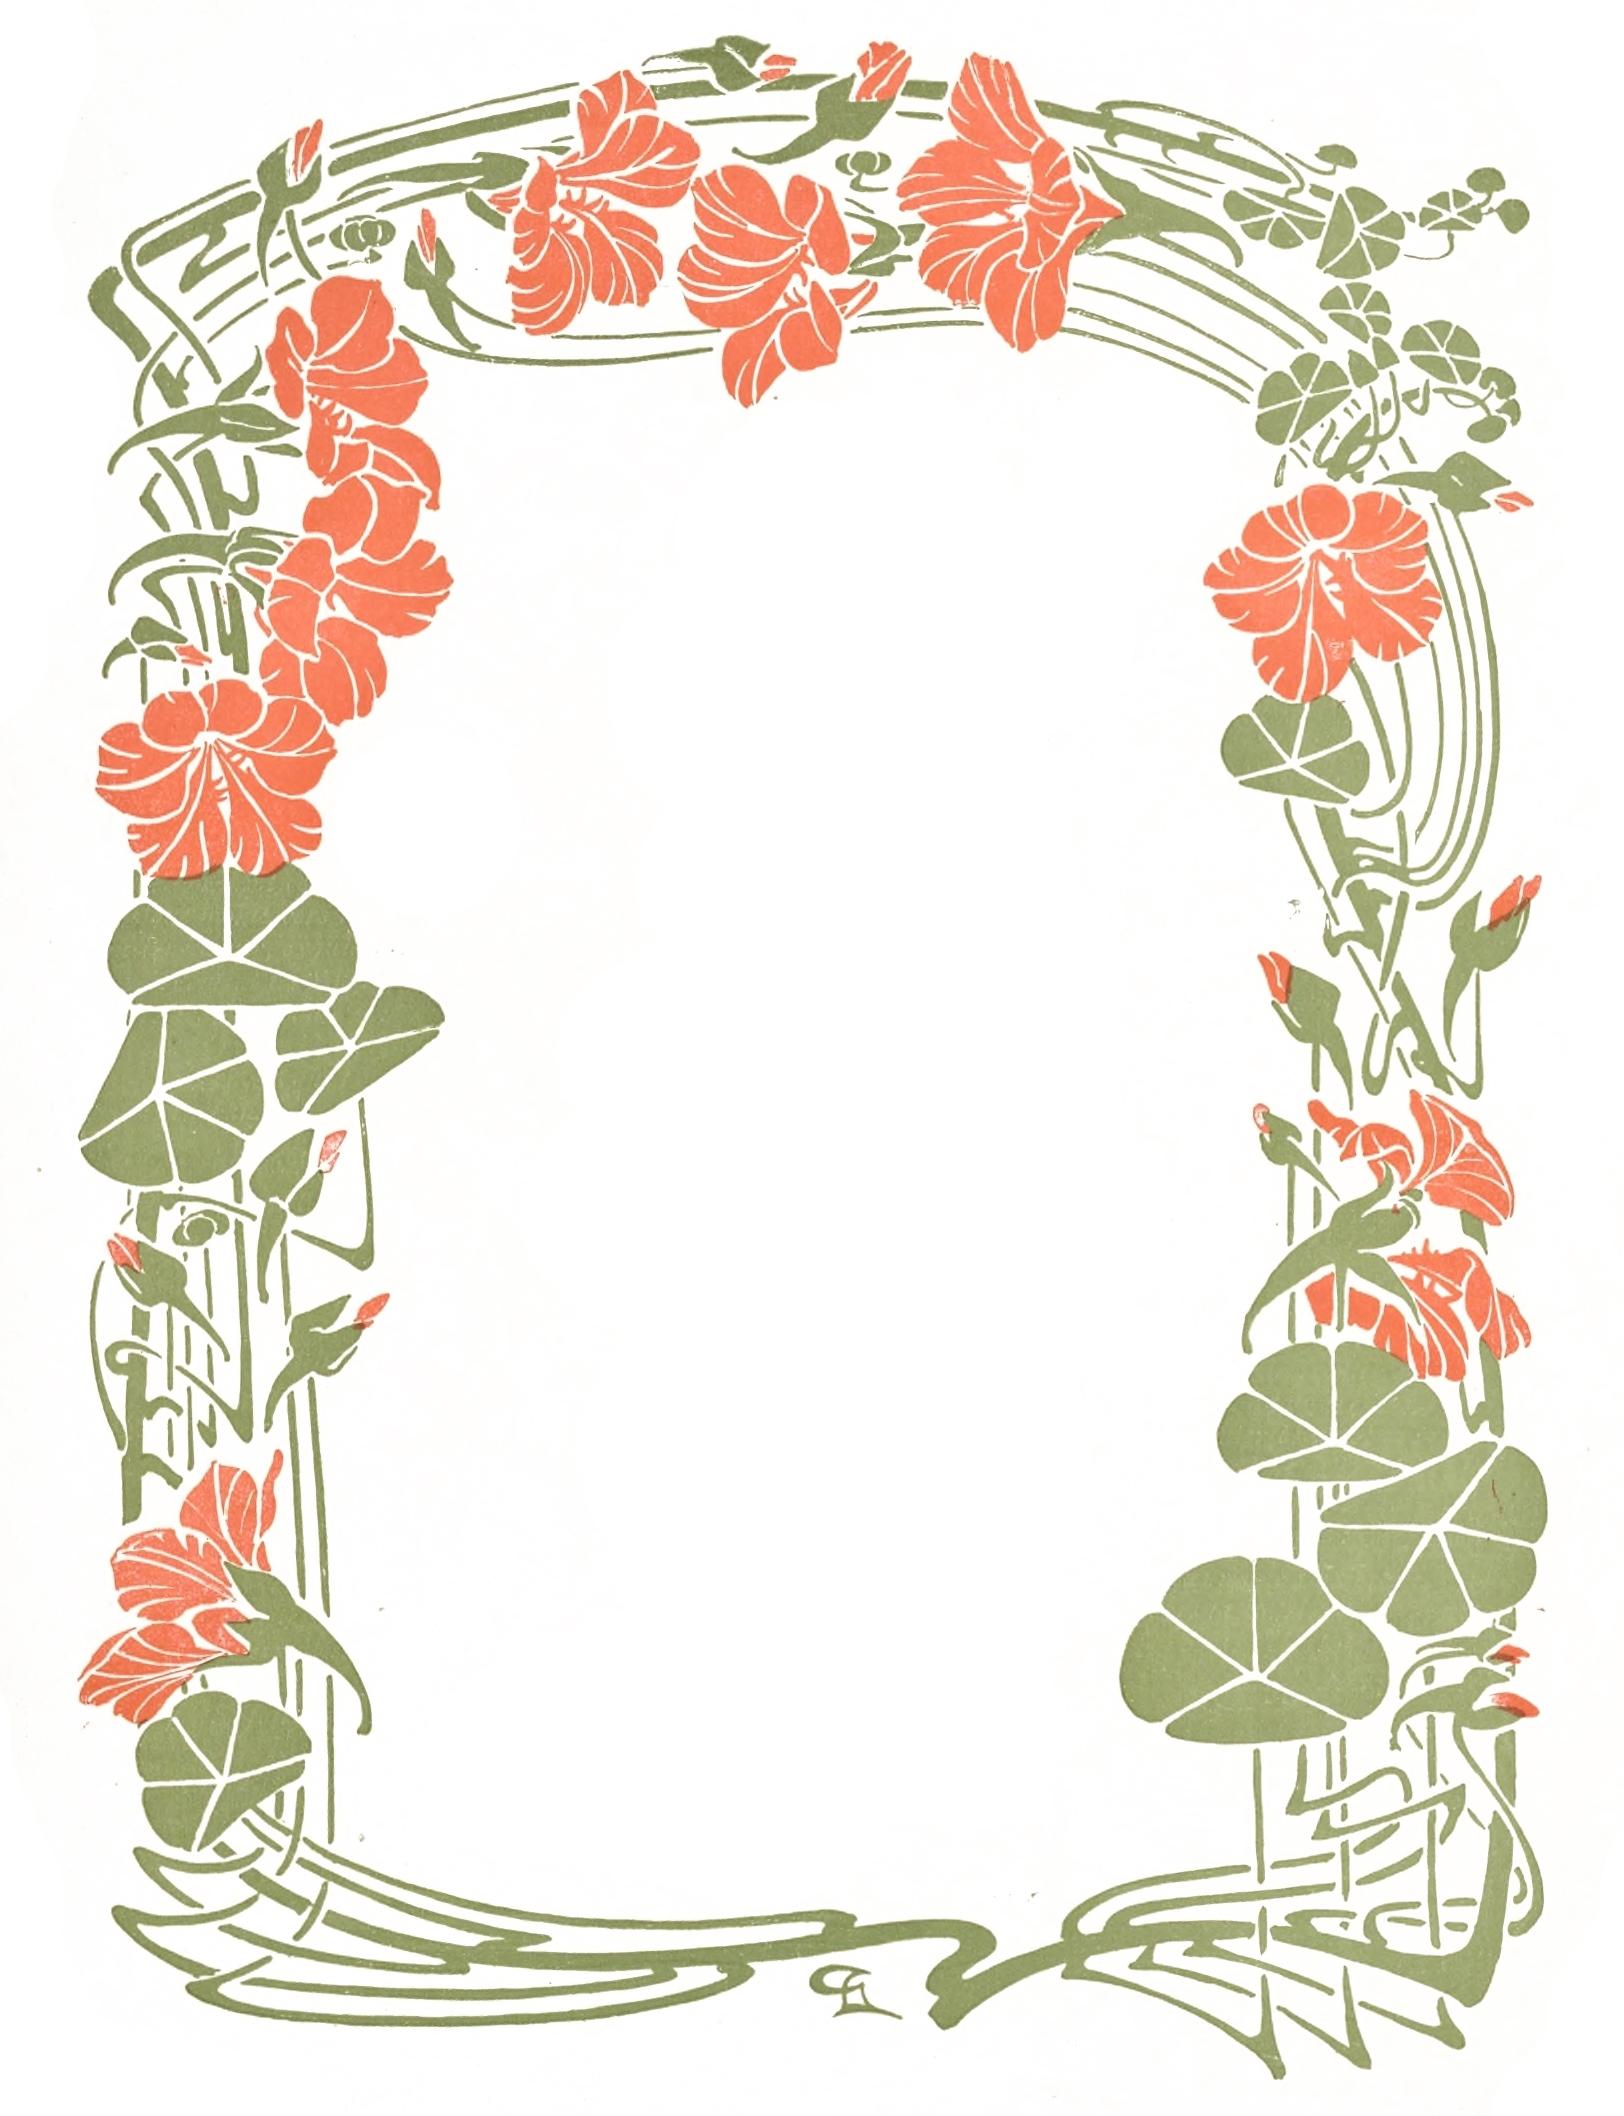 Pinteres… (View 9 of 15)